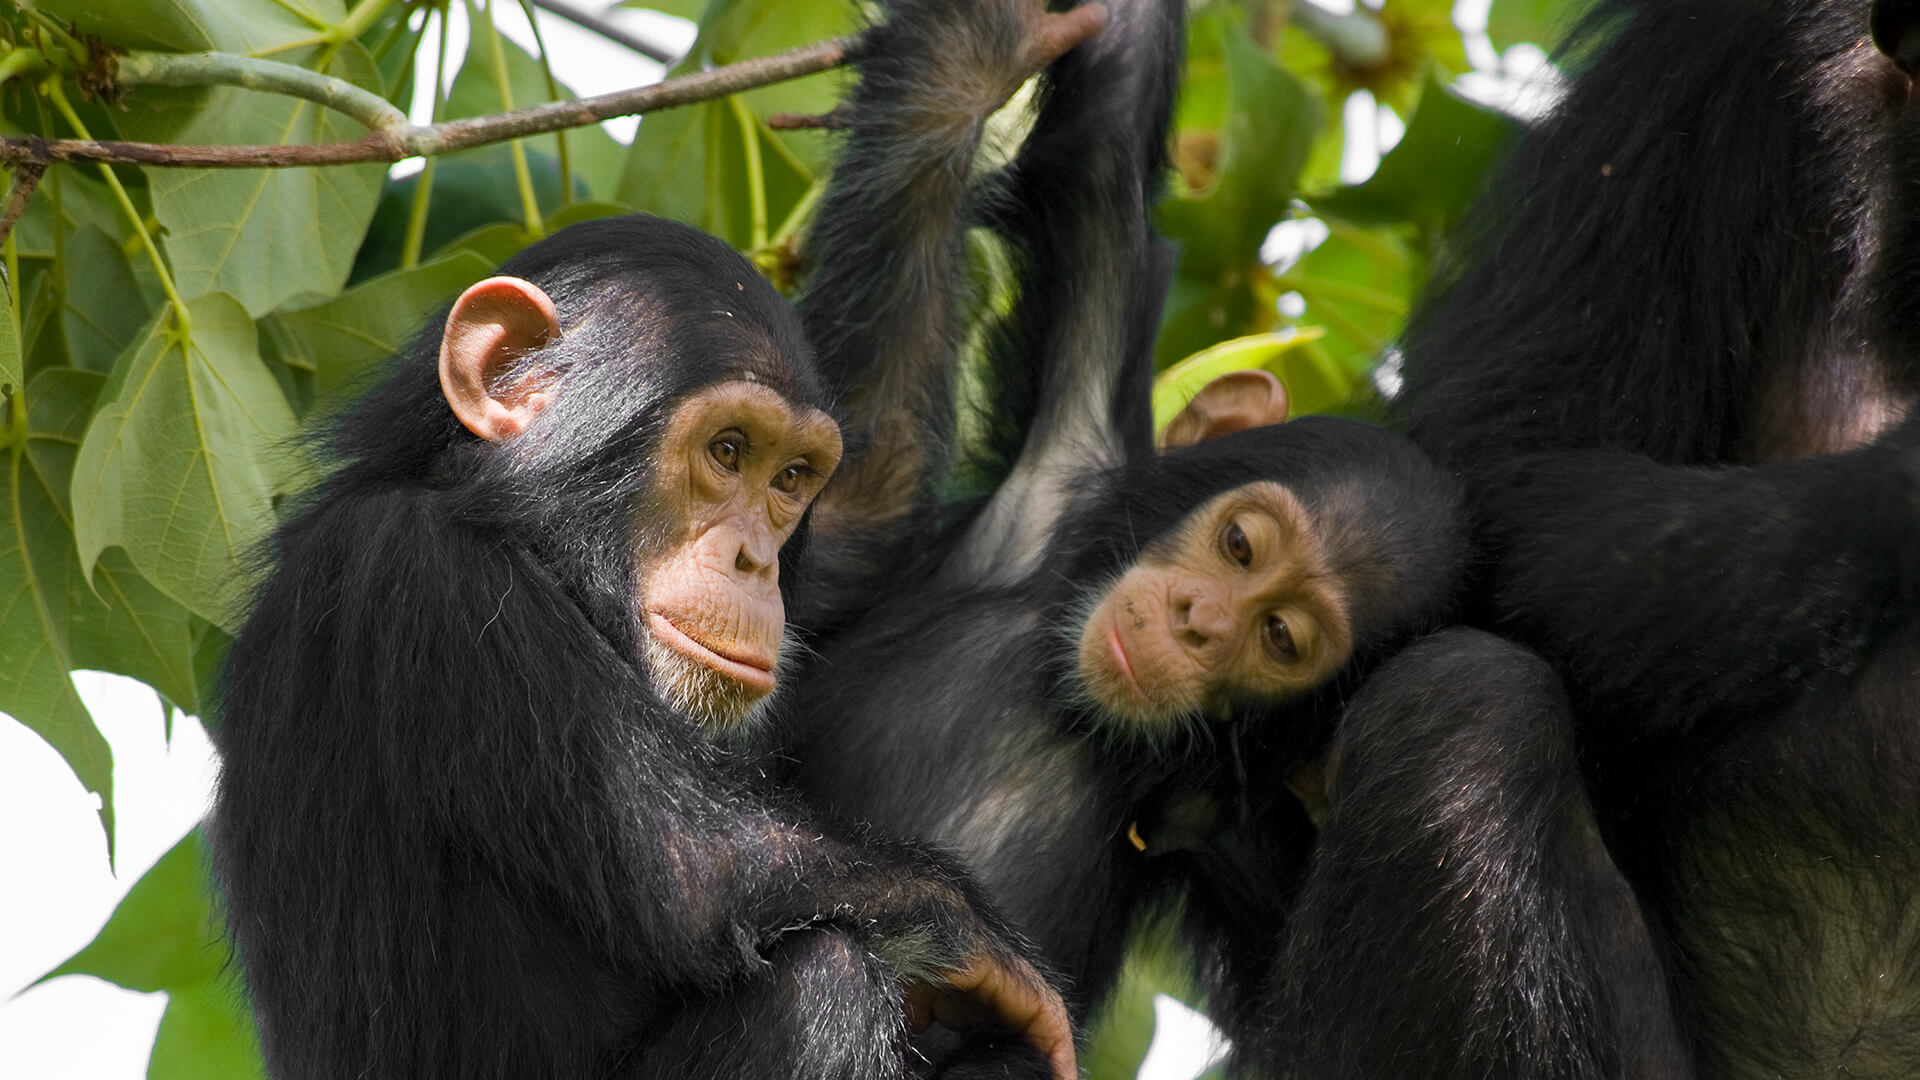 Chimpanzee HD wallpapers, Desktop wallpaper - most viewed